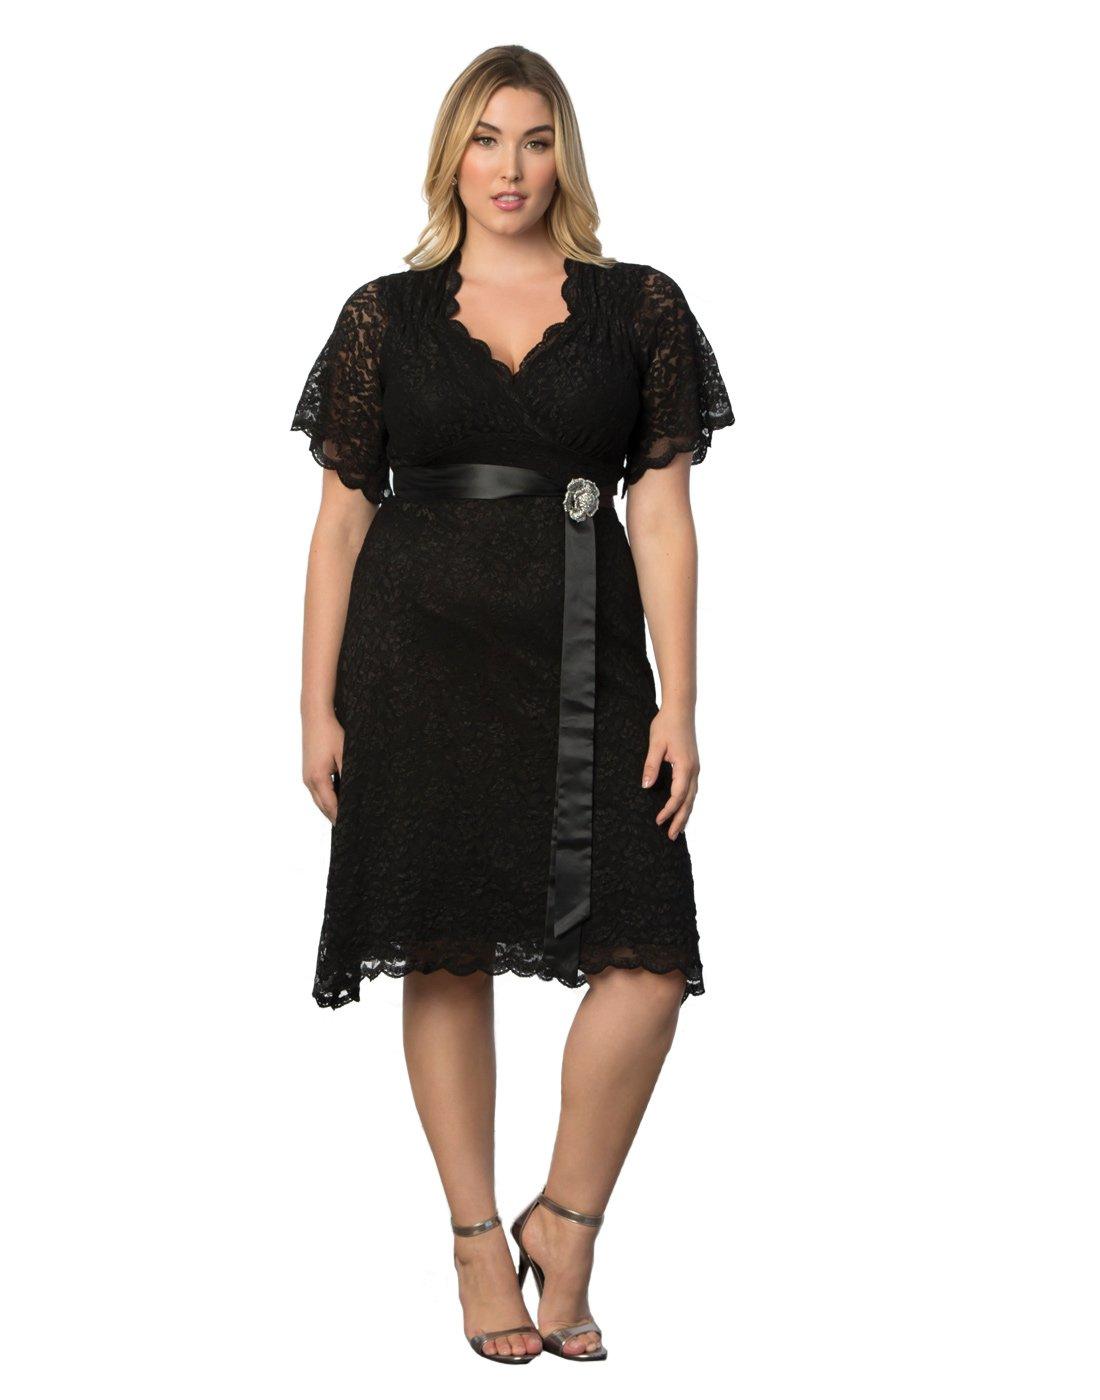 Kiyonna Women's Plus Size Retro Glam Lace Dress 2x Black Lace/Black Lining